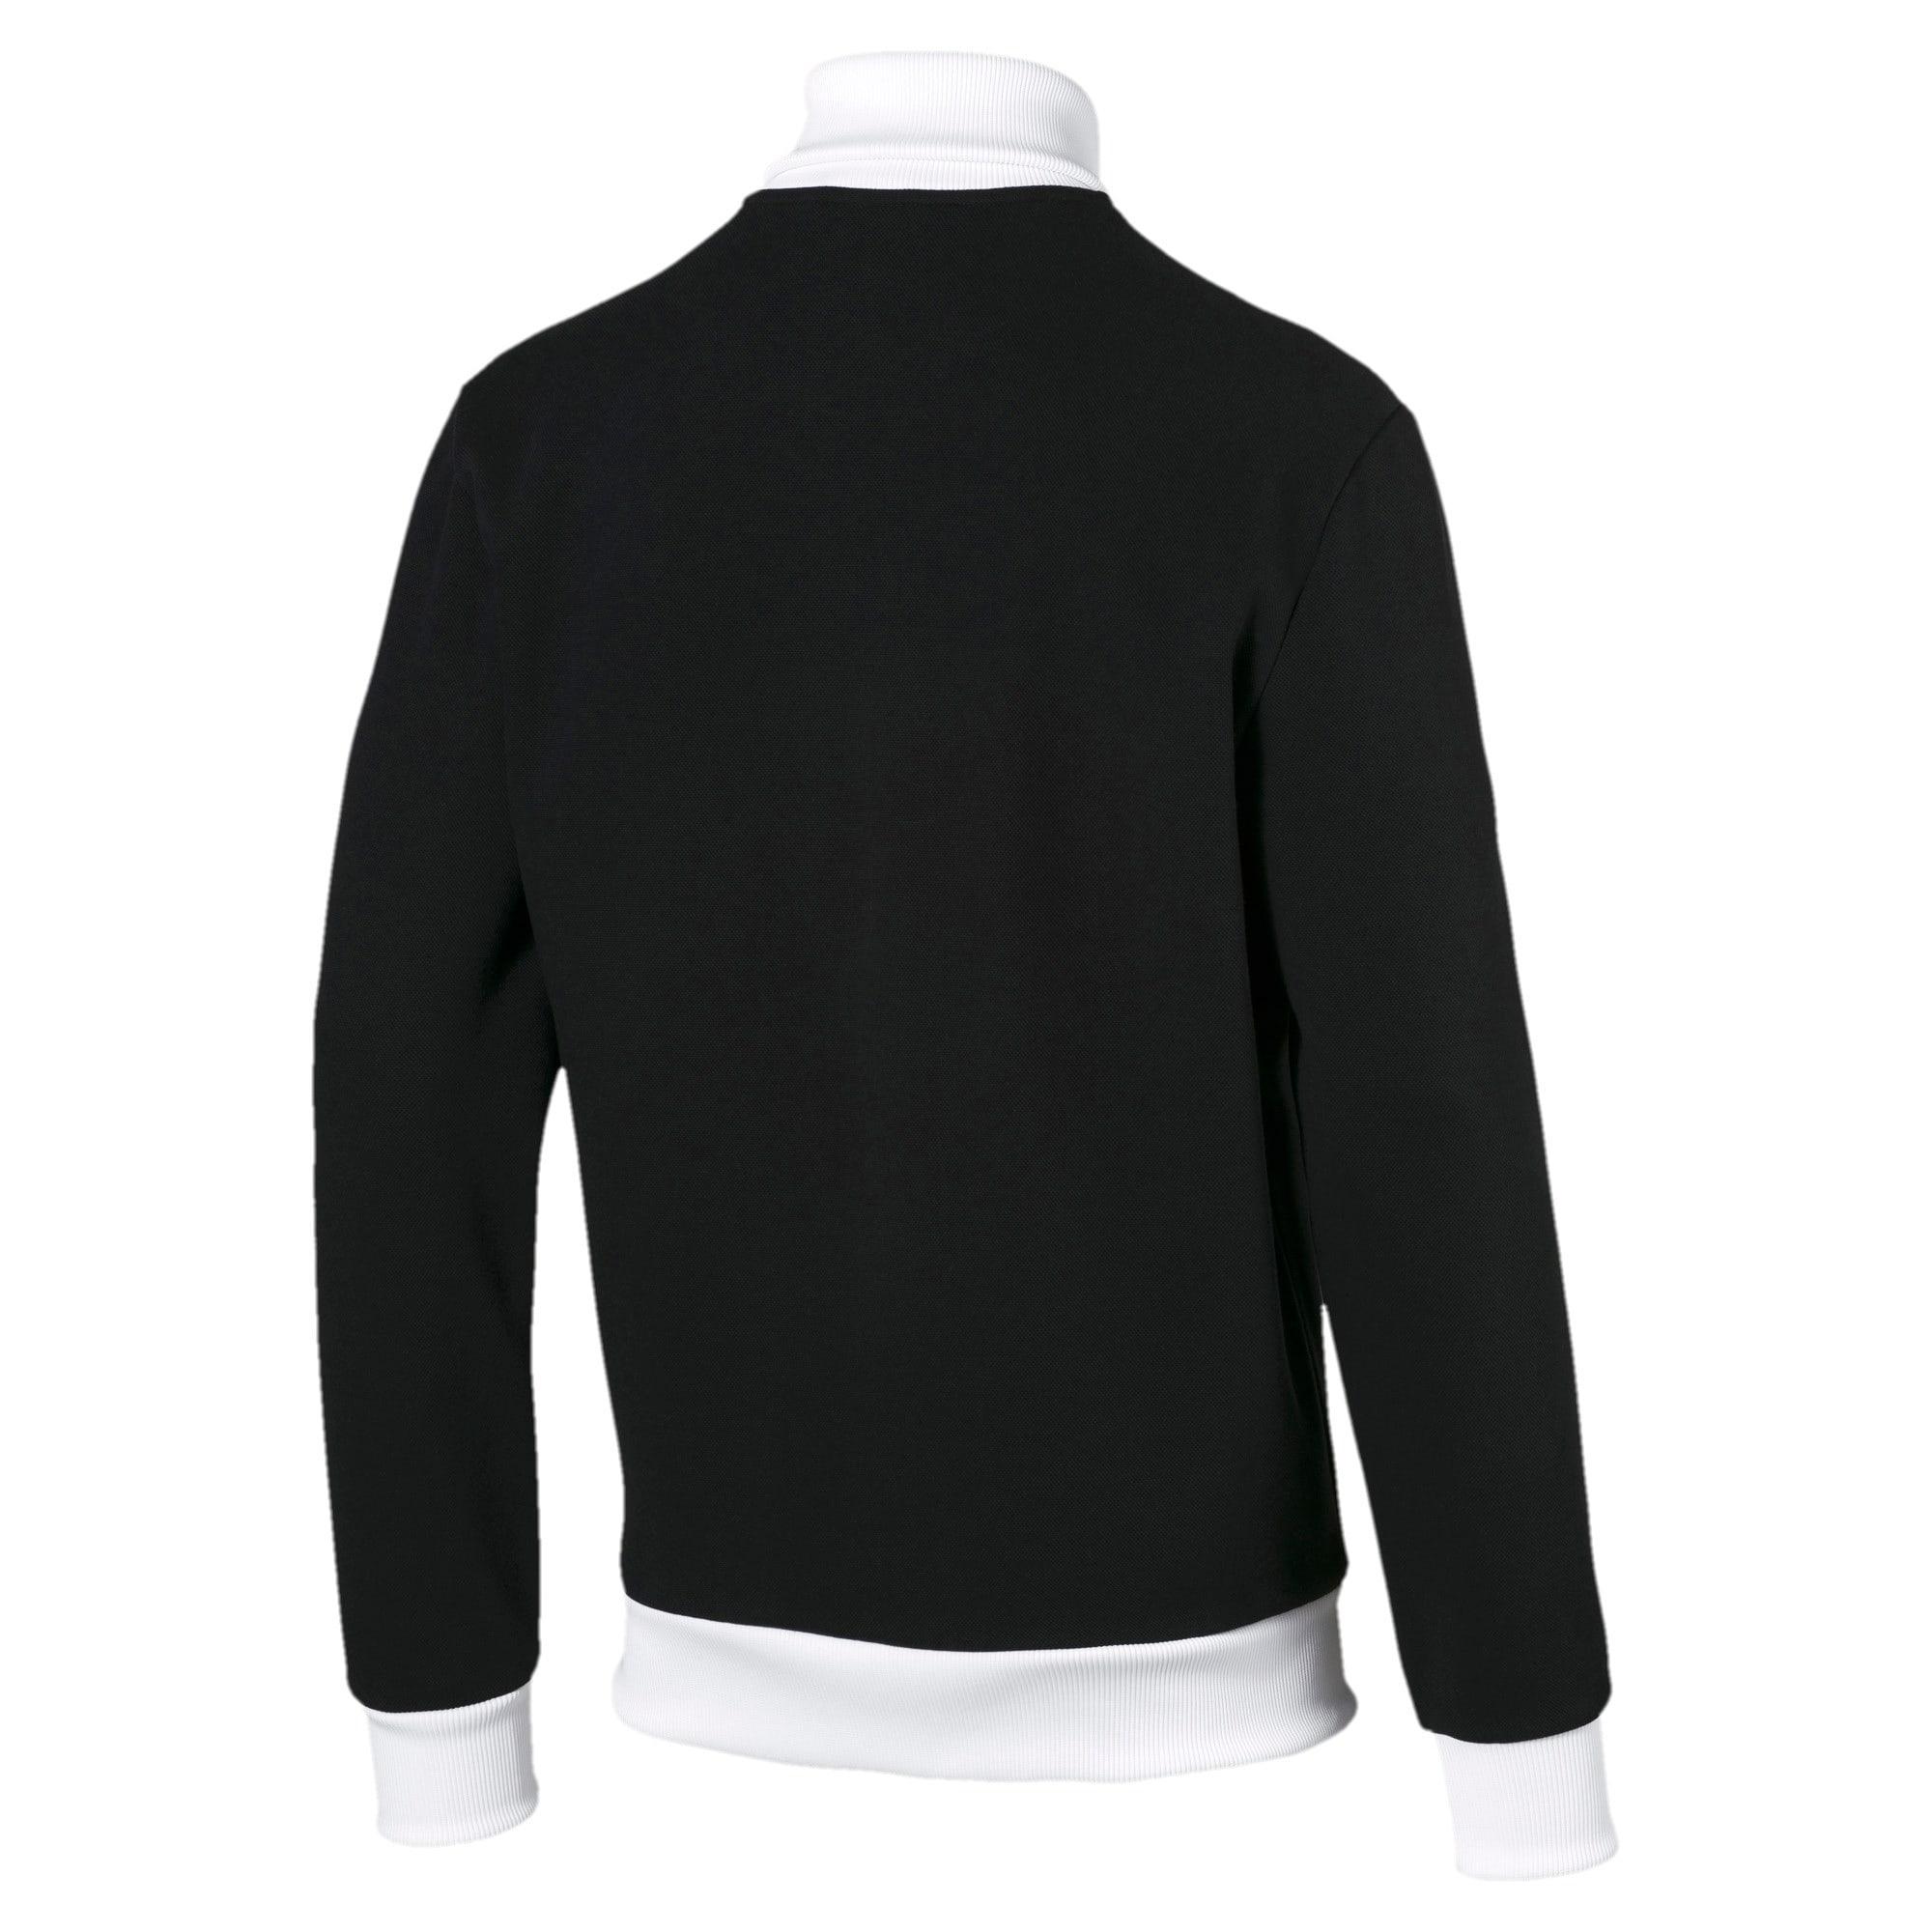 Thumbnail 3 of Iconic T7 Spezial Men's Track Jacket, Cotton Black, medium